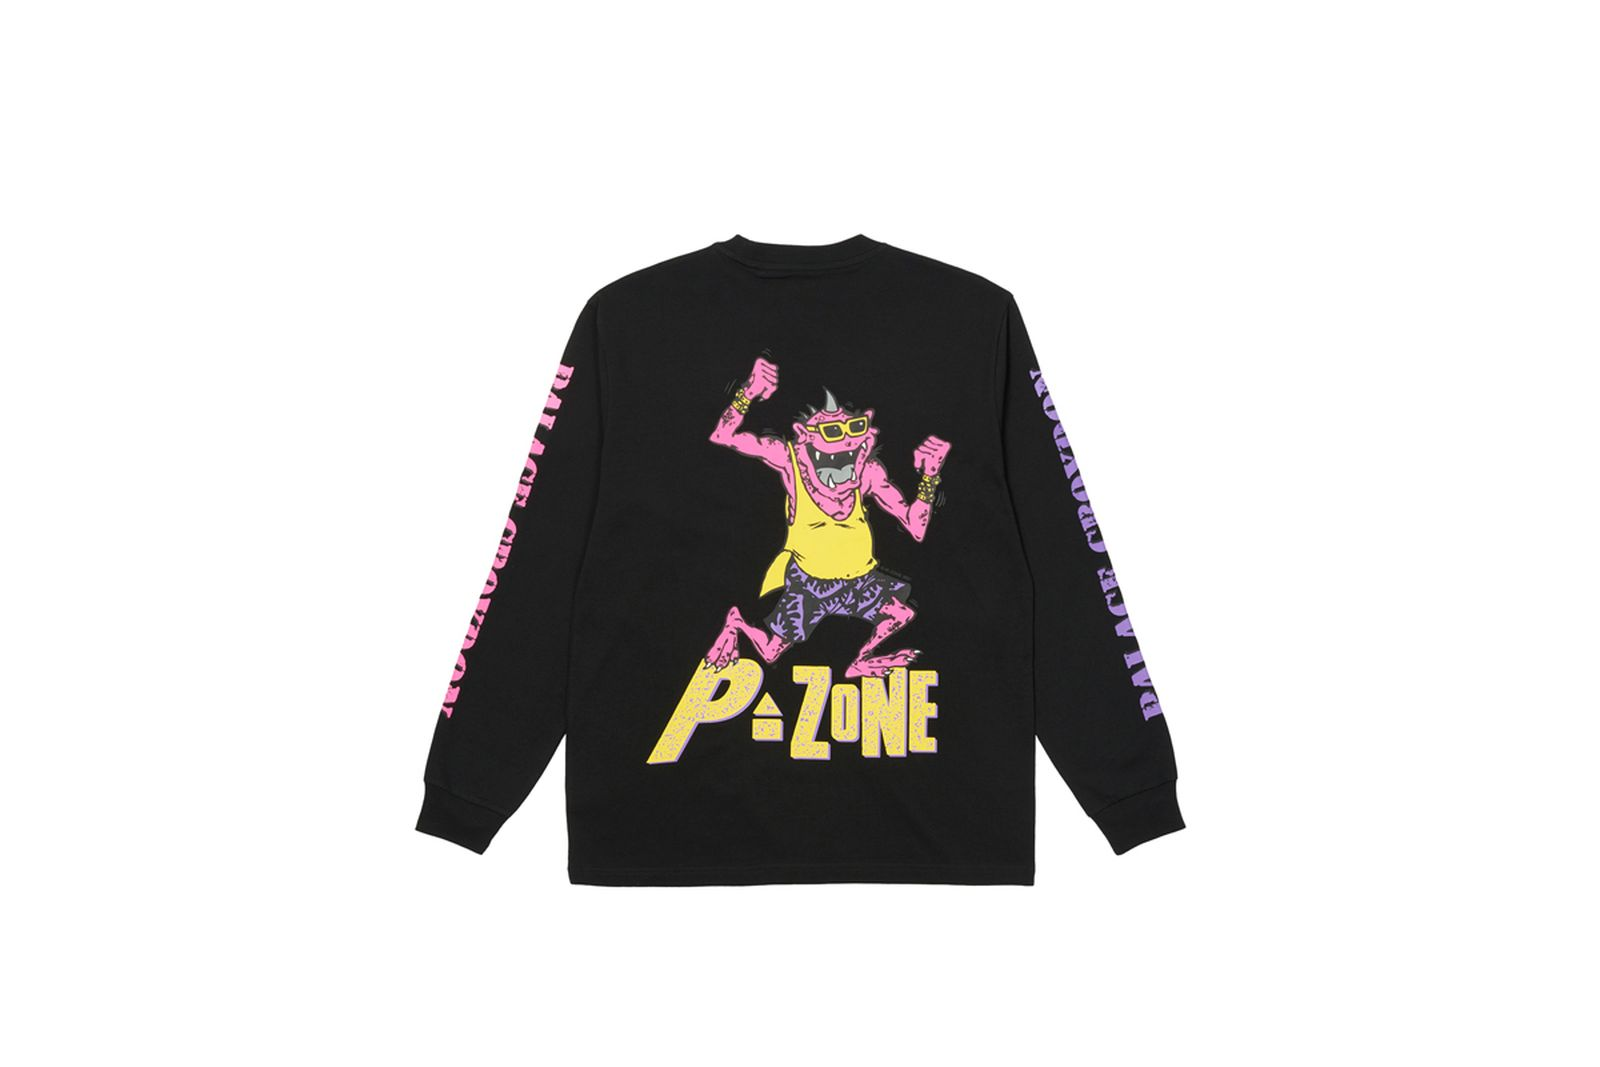 palace-m-zone-ss21-collaboration- (8)